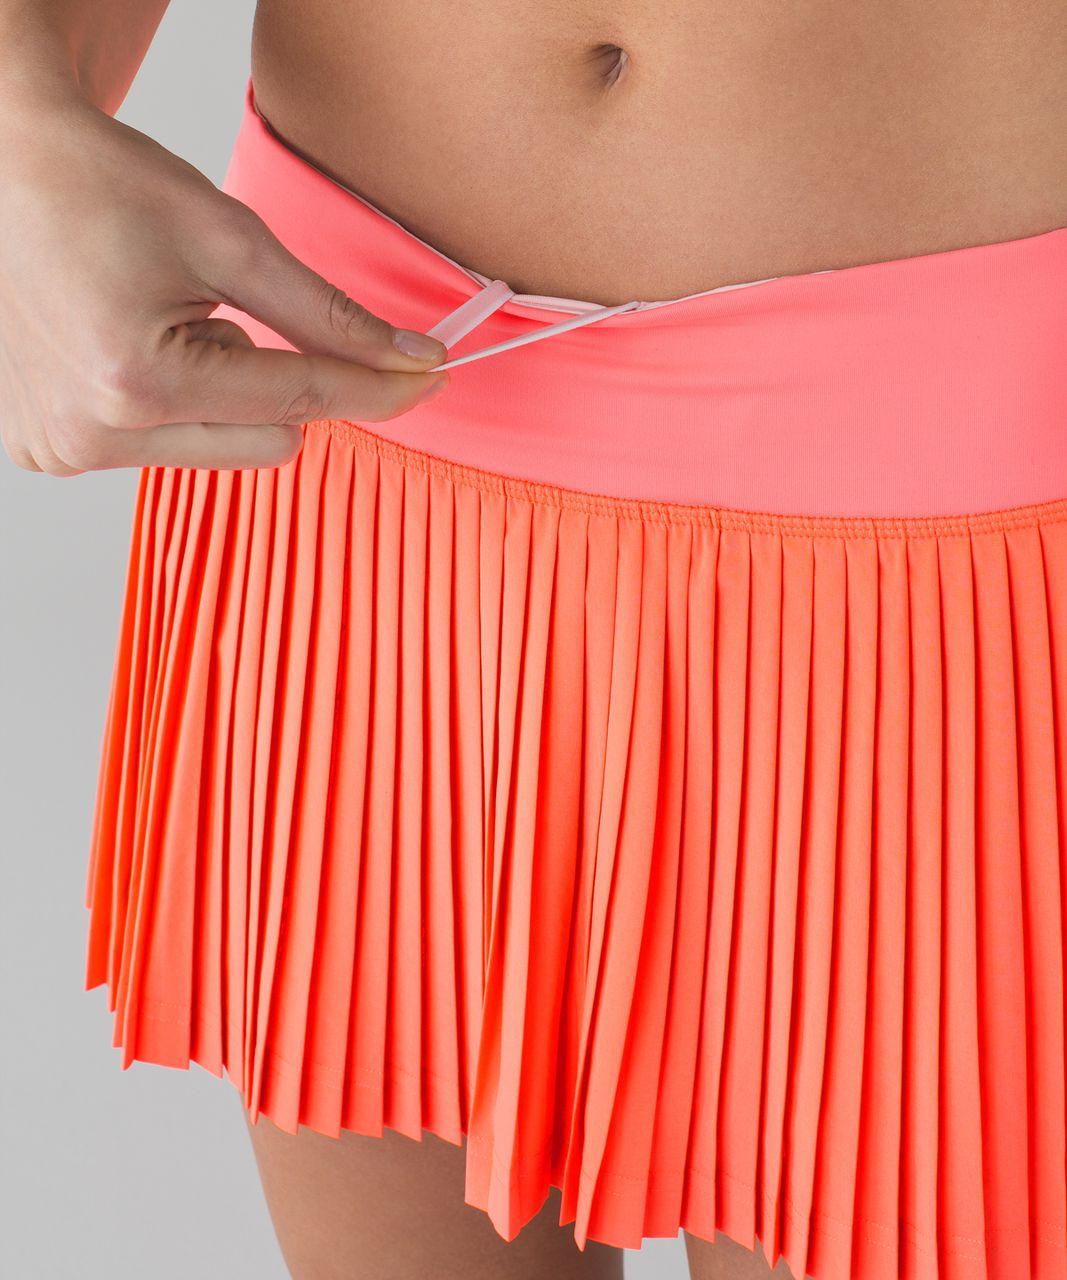 e7f310b02e Lululemon Pleat To Street Skirt II - Grapefruit - lulu fanatics